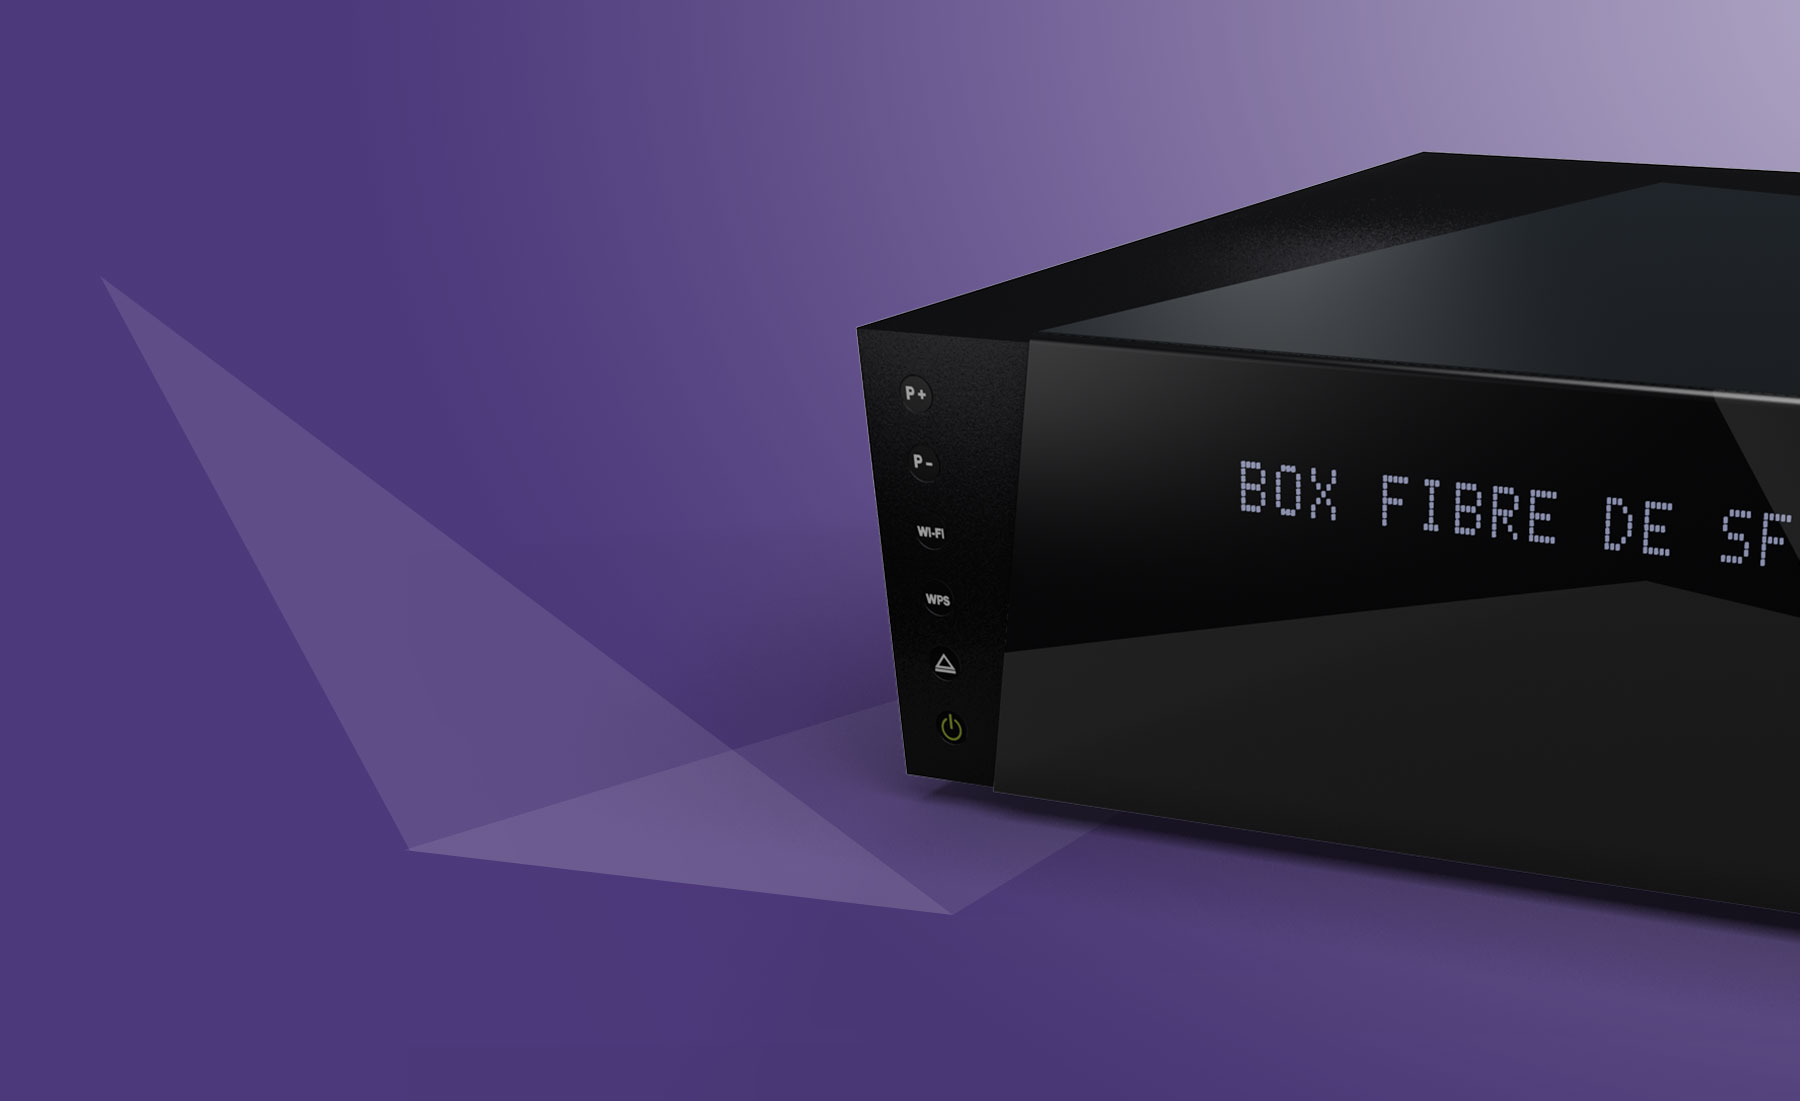 offre box pro sfr box home de sfr pack